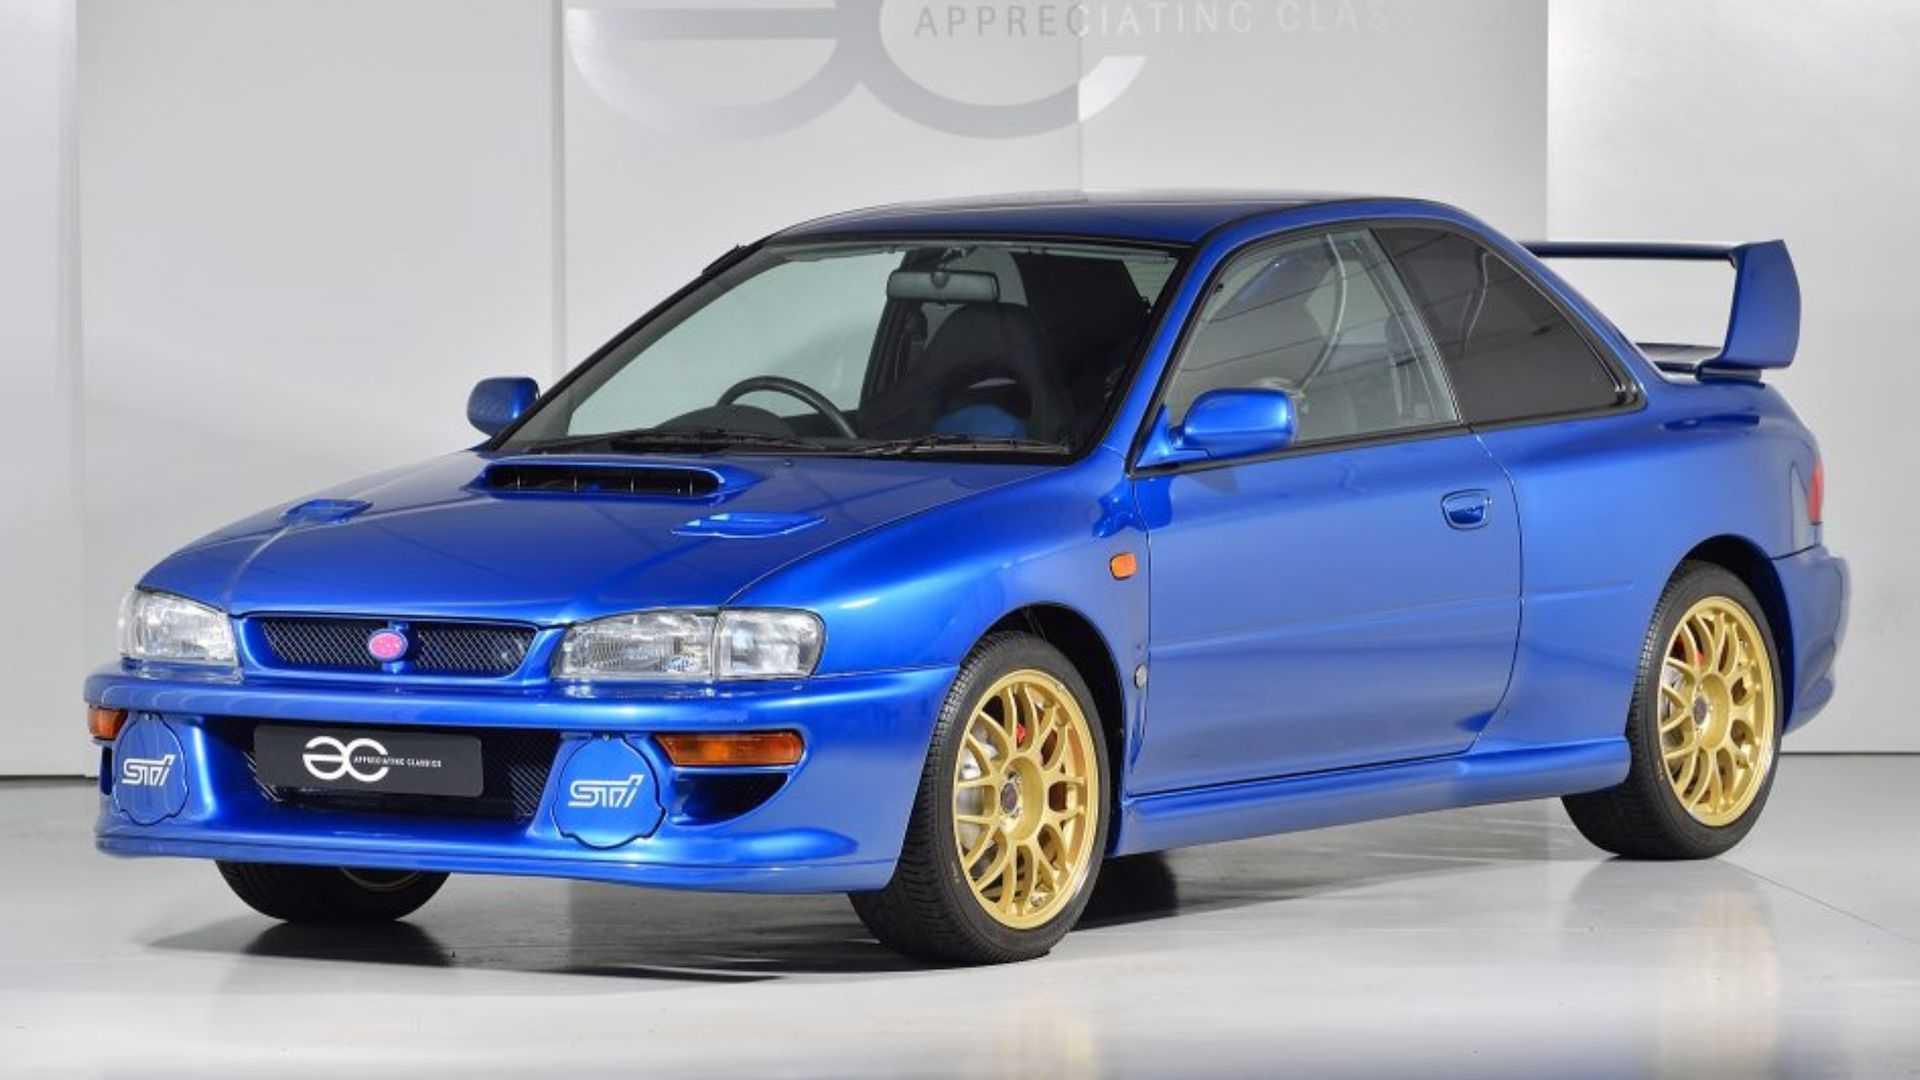 Subaru Impreza 22B STi 1998, JDM Super-Langka Berbanderol Lima Miliar